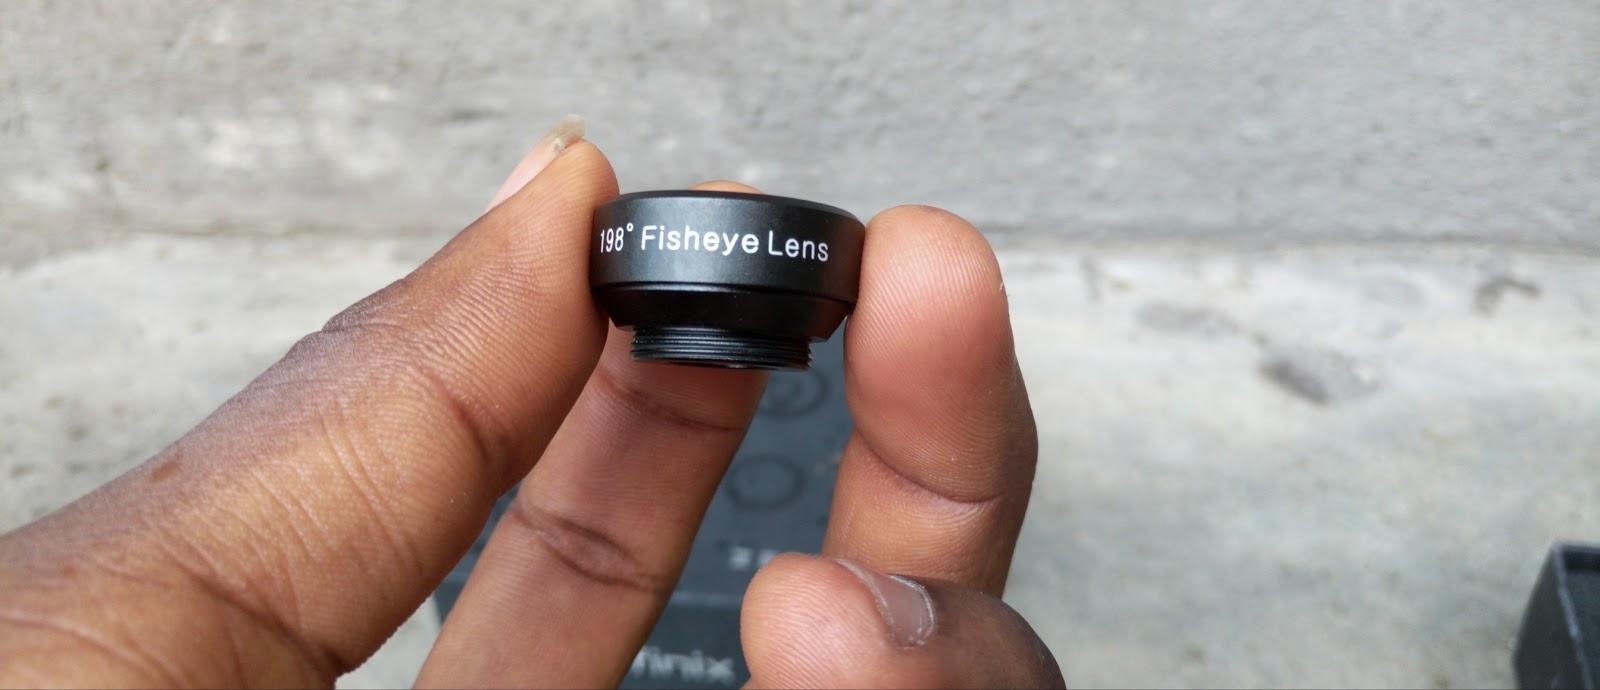 198° fish eye lens